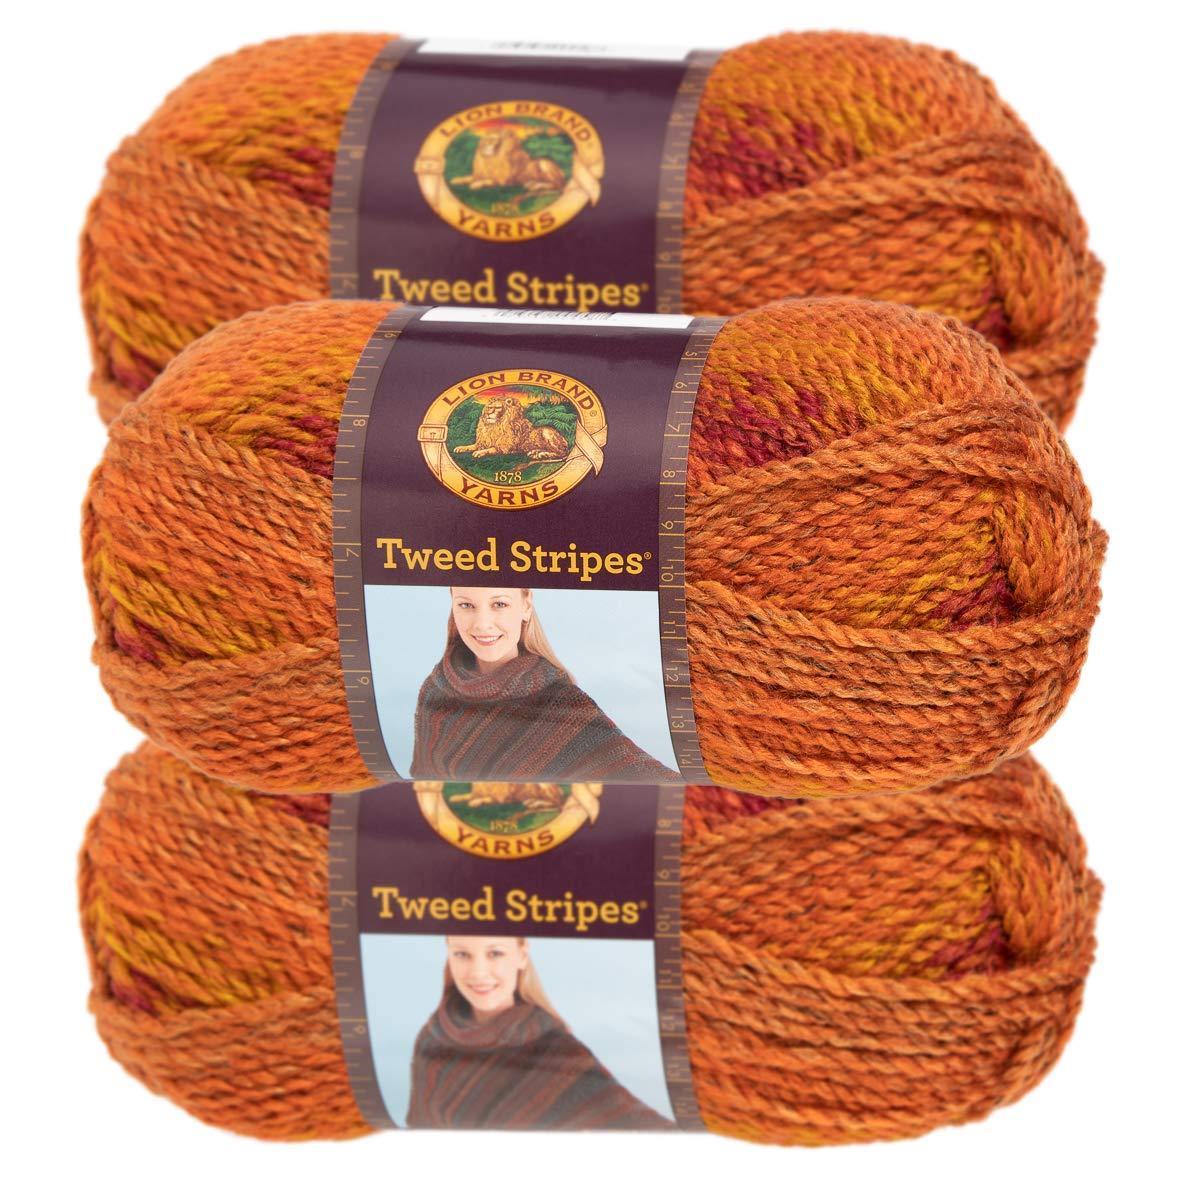 3 Pack Chunky Yarn Acrylic 100 Percent Soft Yarn for Knitting Crocheting Bulky #5 Lion Brand Yarn